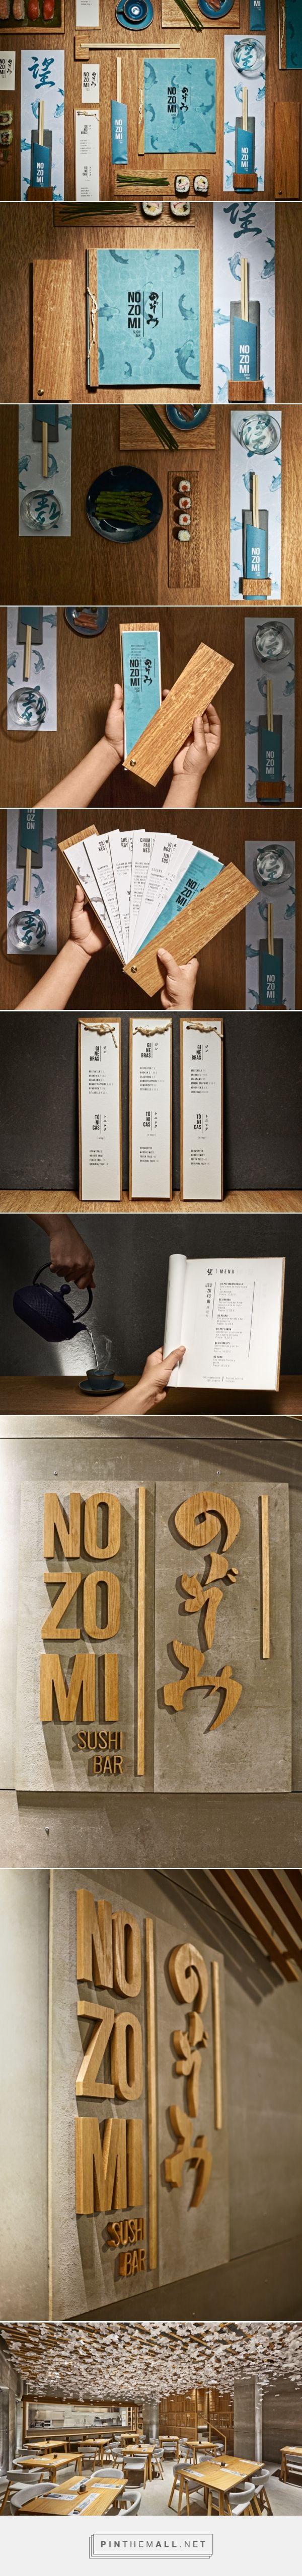 Nozomi Sushi Bar | Masquespacio - created via http://pinthemall.net